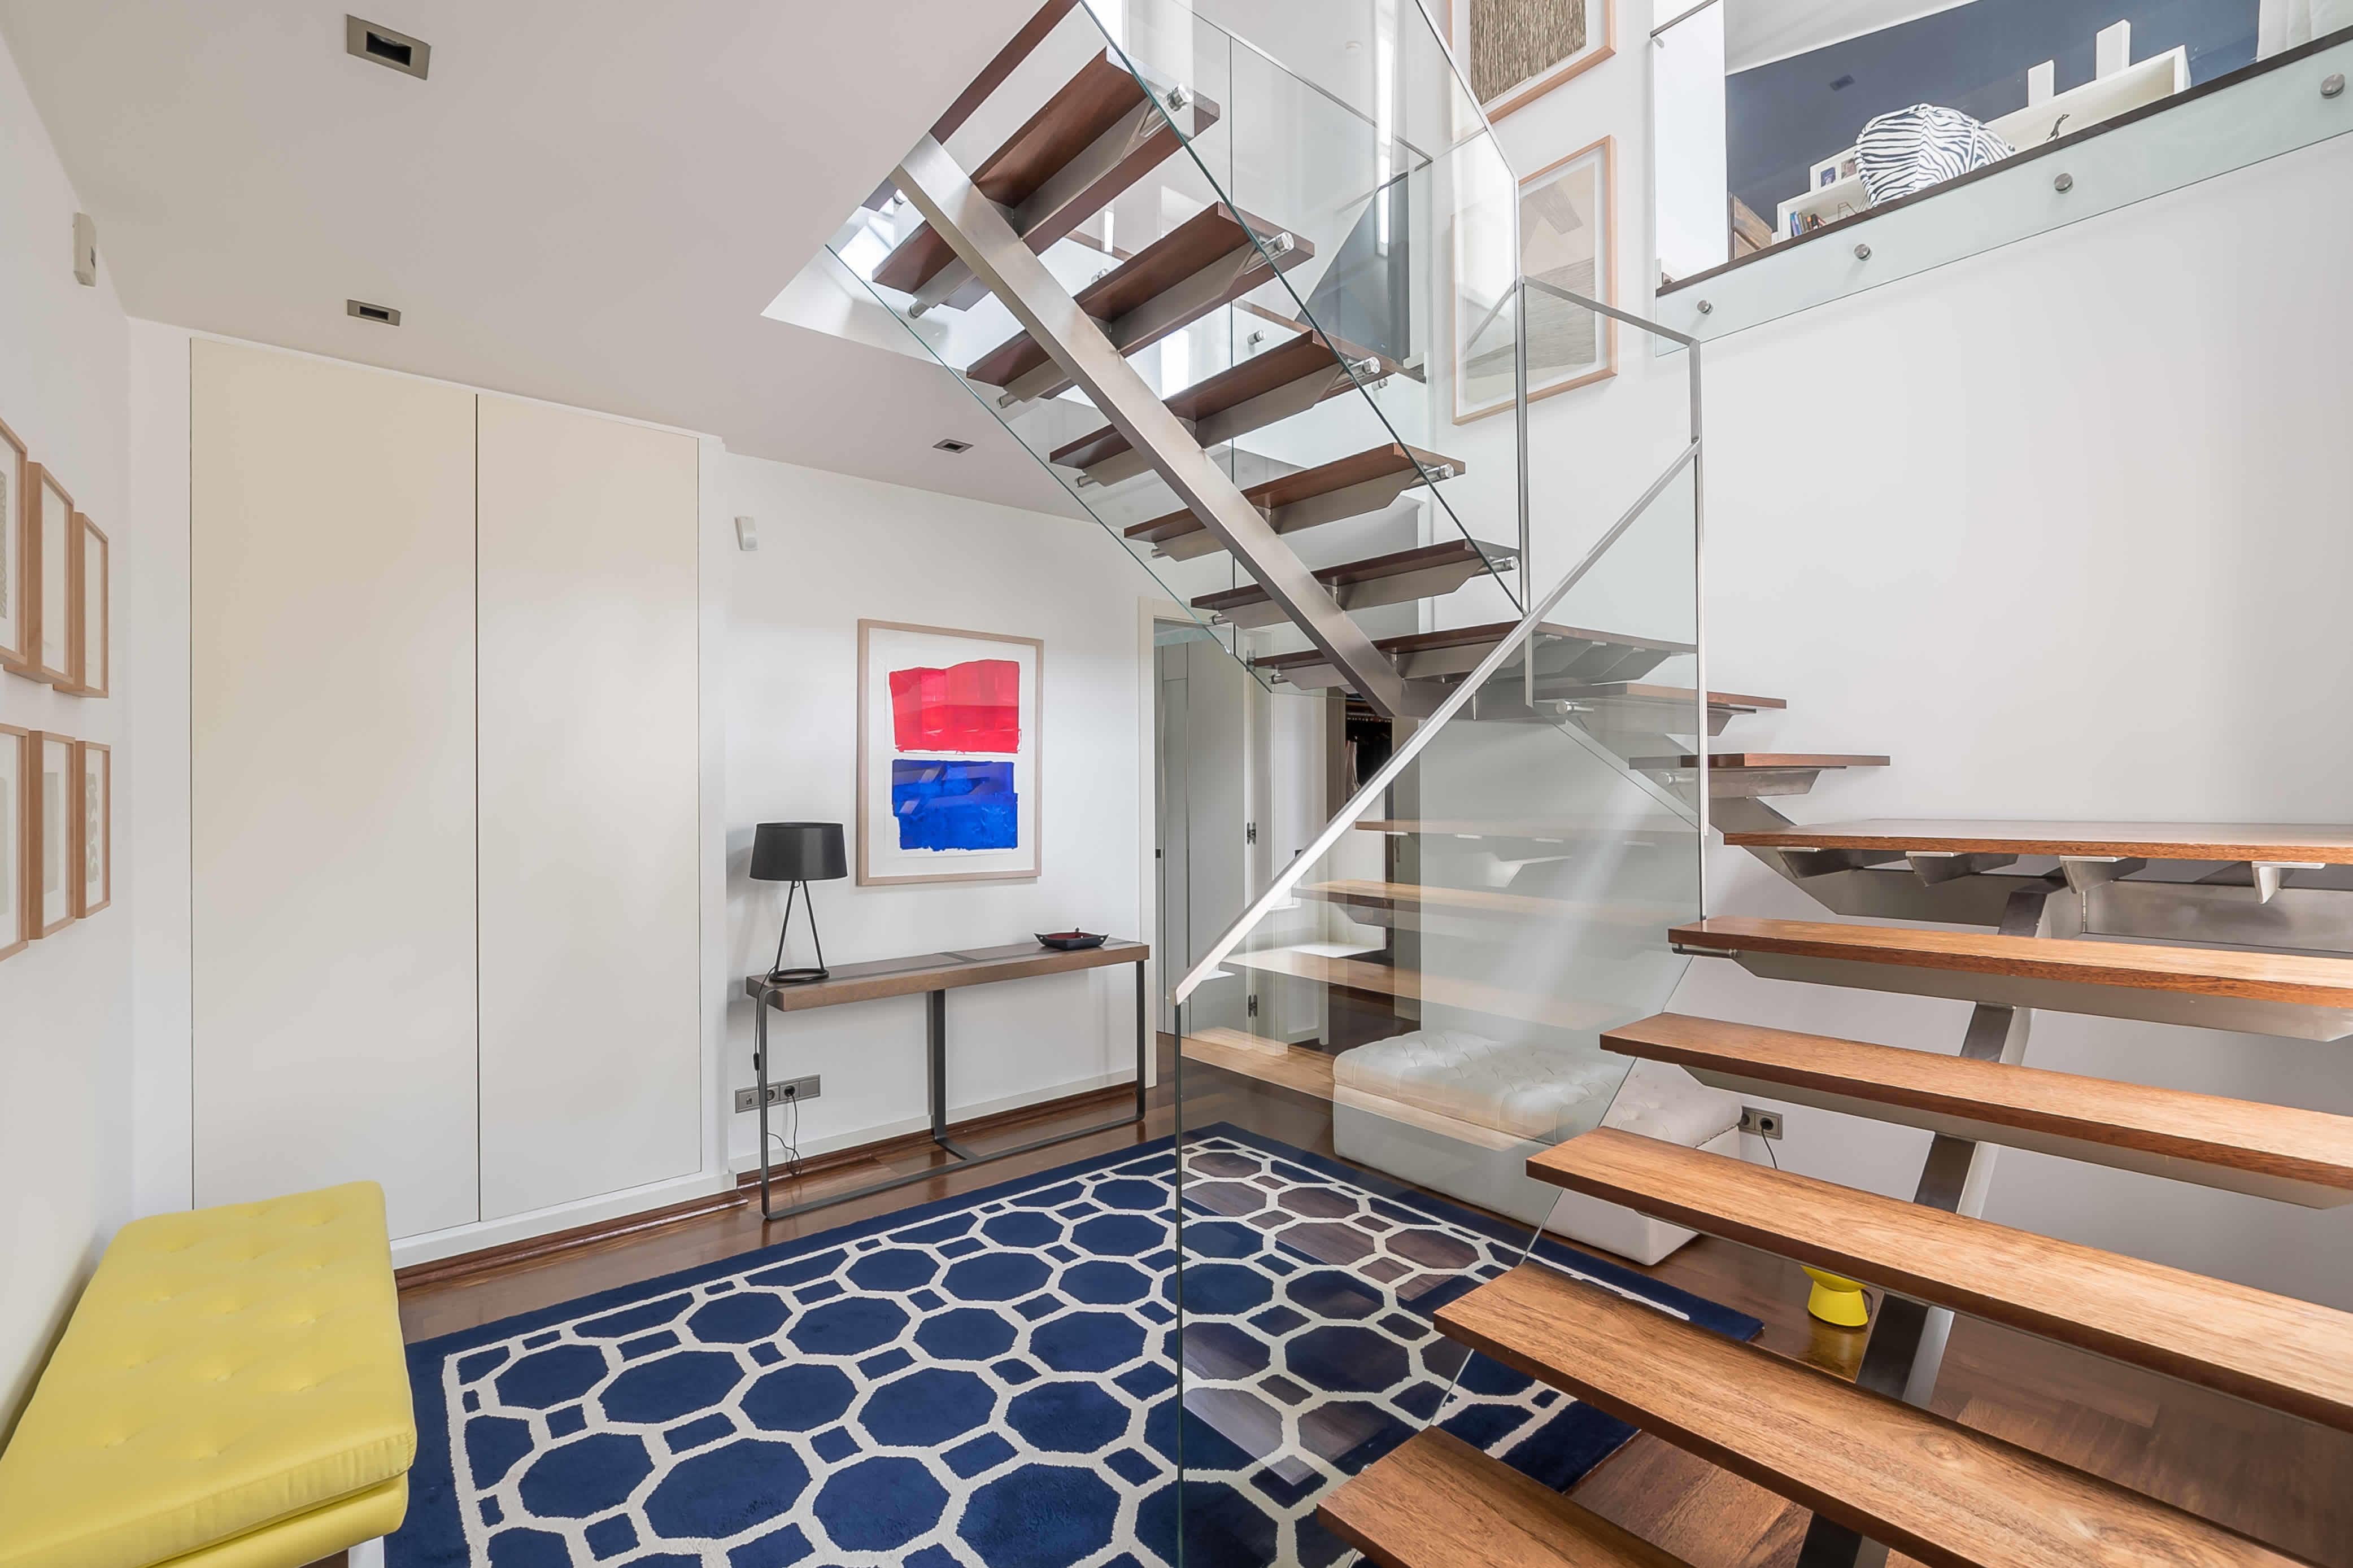 exceptionnel-duplex-a-vendre-chiado-batiment-renove-parking-cave